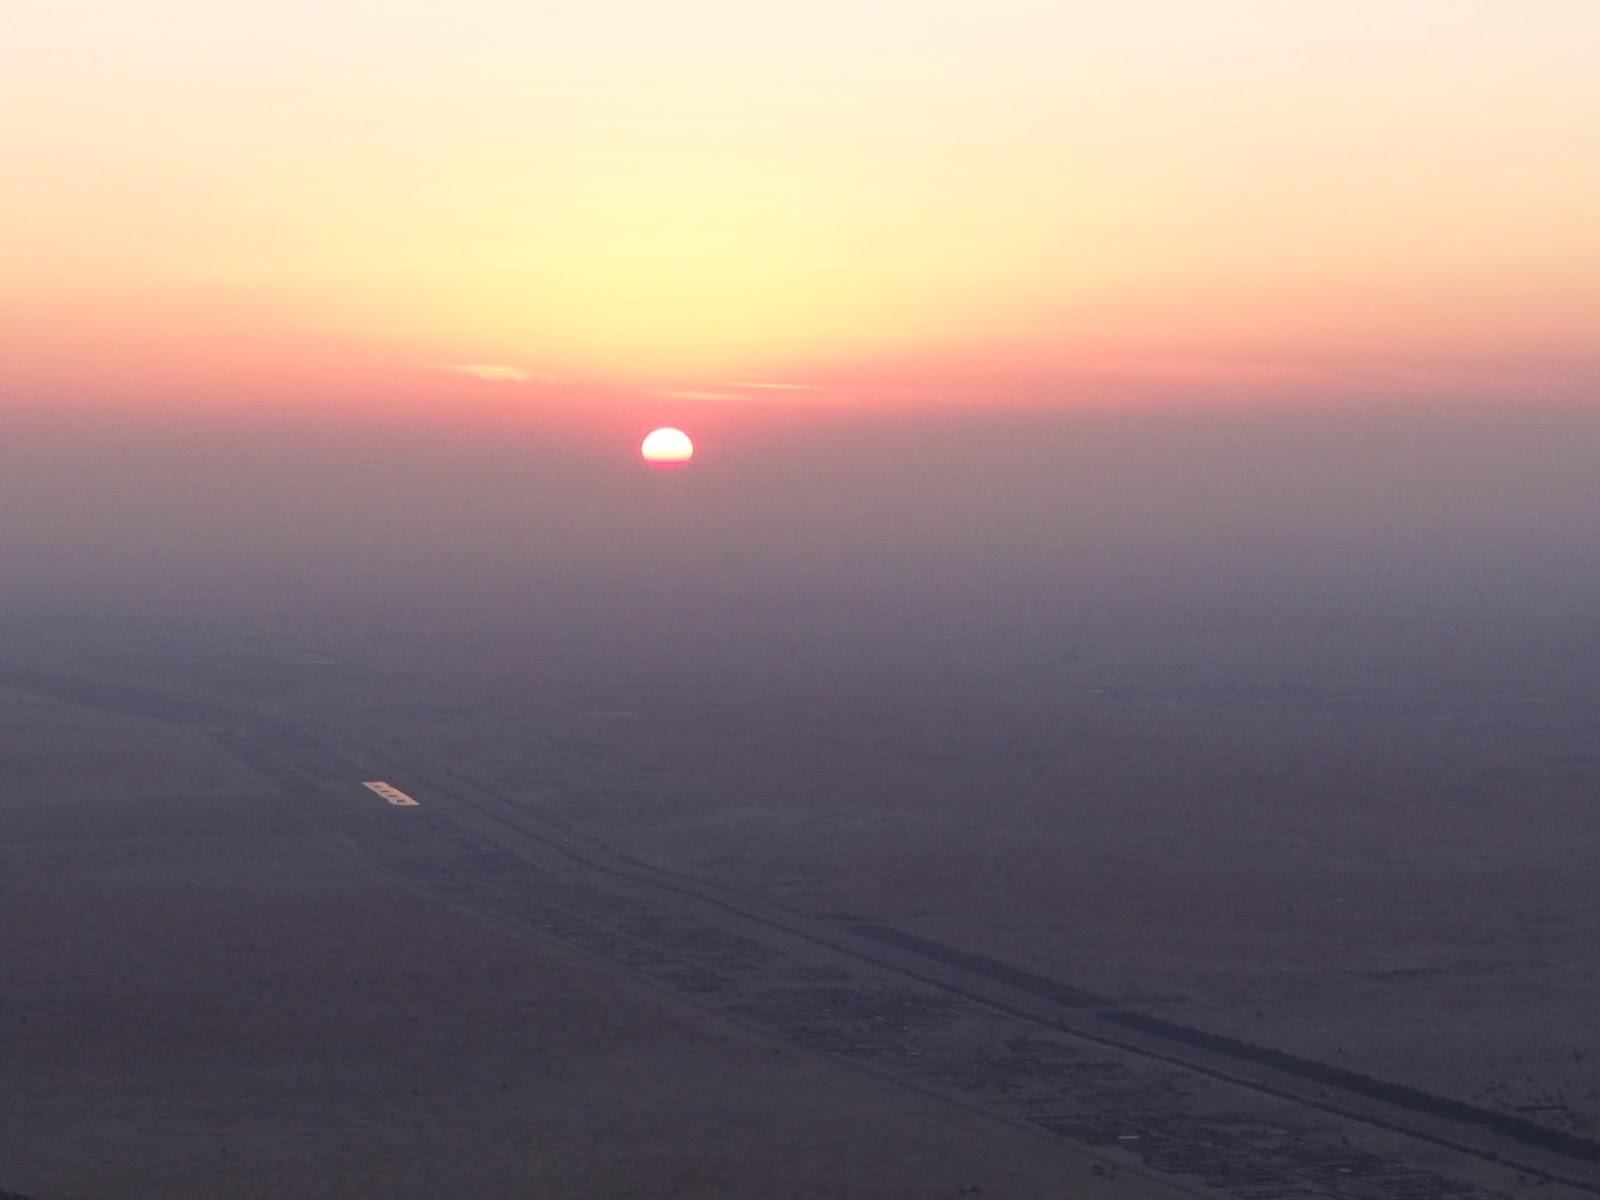 Jebel Hafeet Abu Dhabi